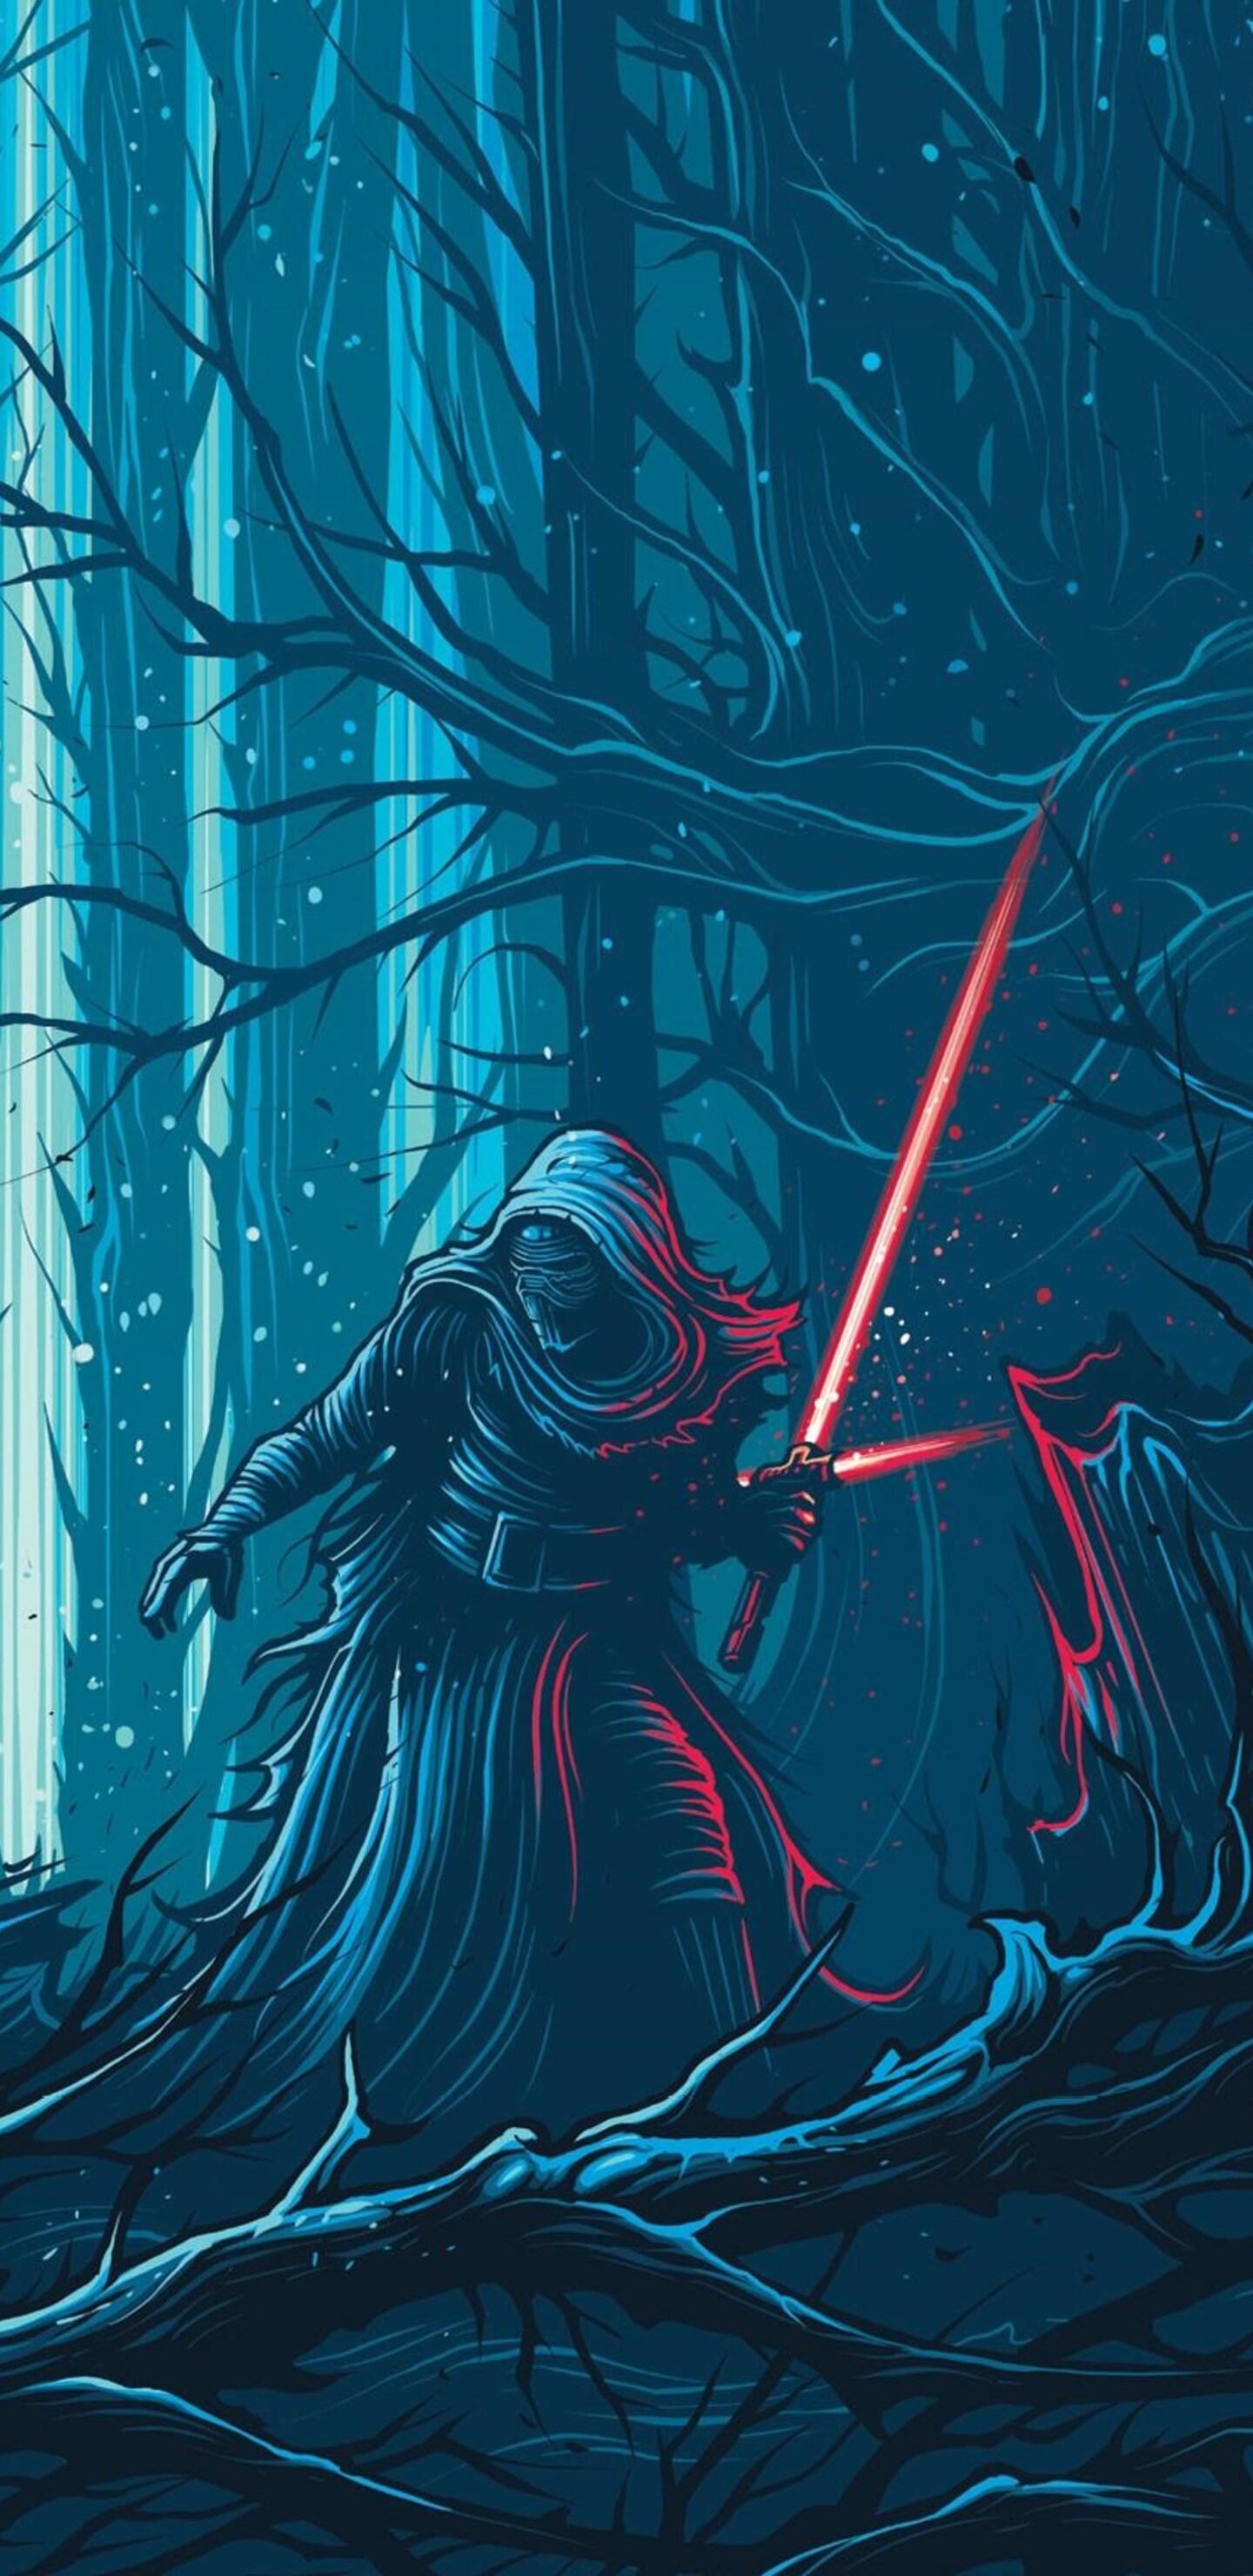 Download Note 9 Wallpaper Star Wars Cikimm Com